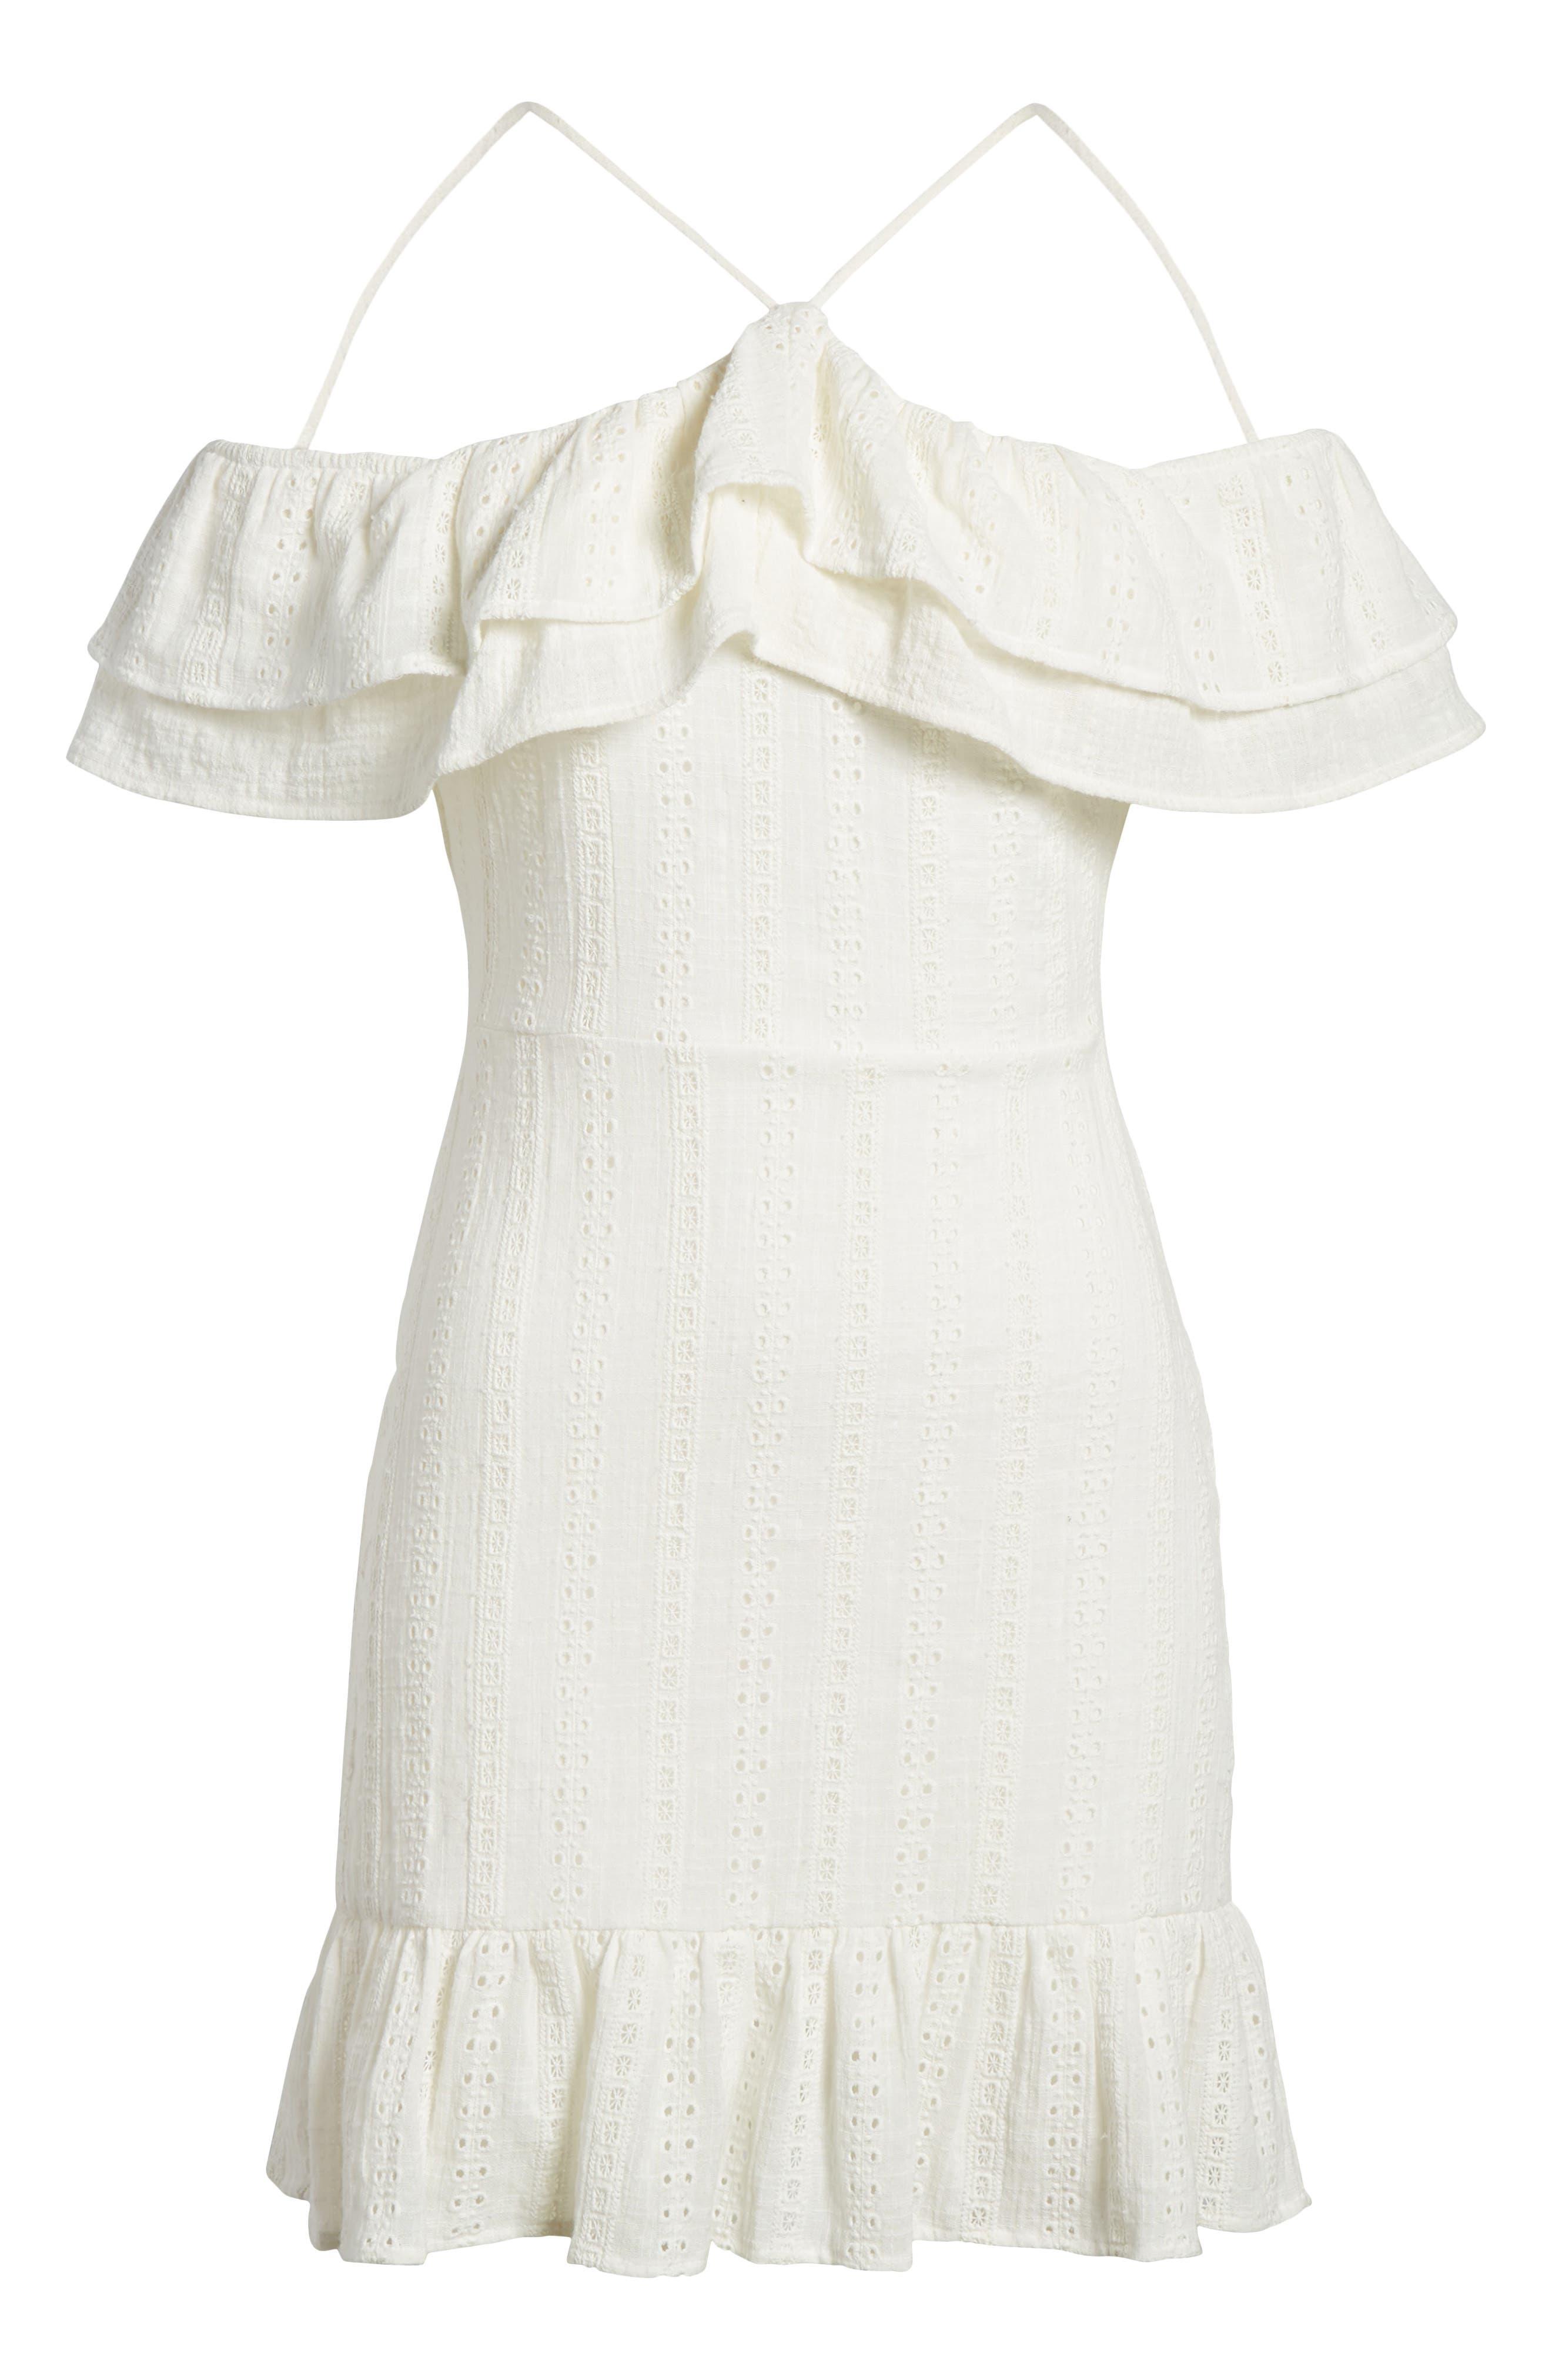 Daisy Eyelet Minidress,                             Alternate thumbnail 7, color,                             White